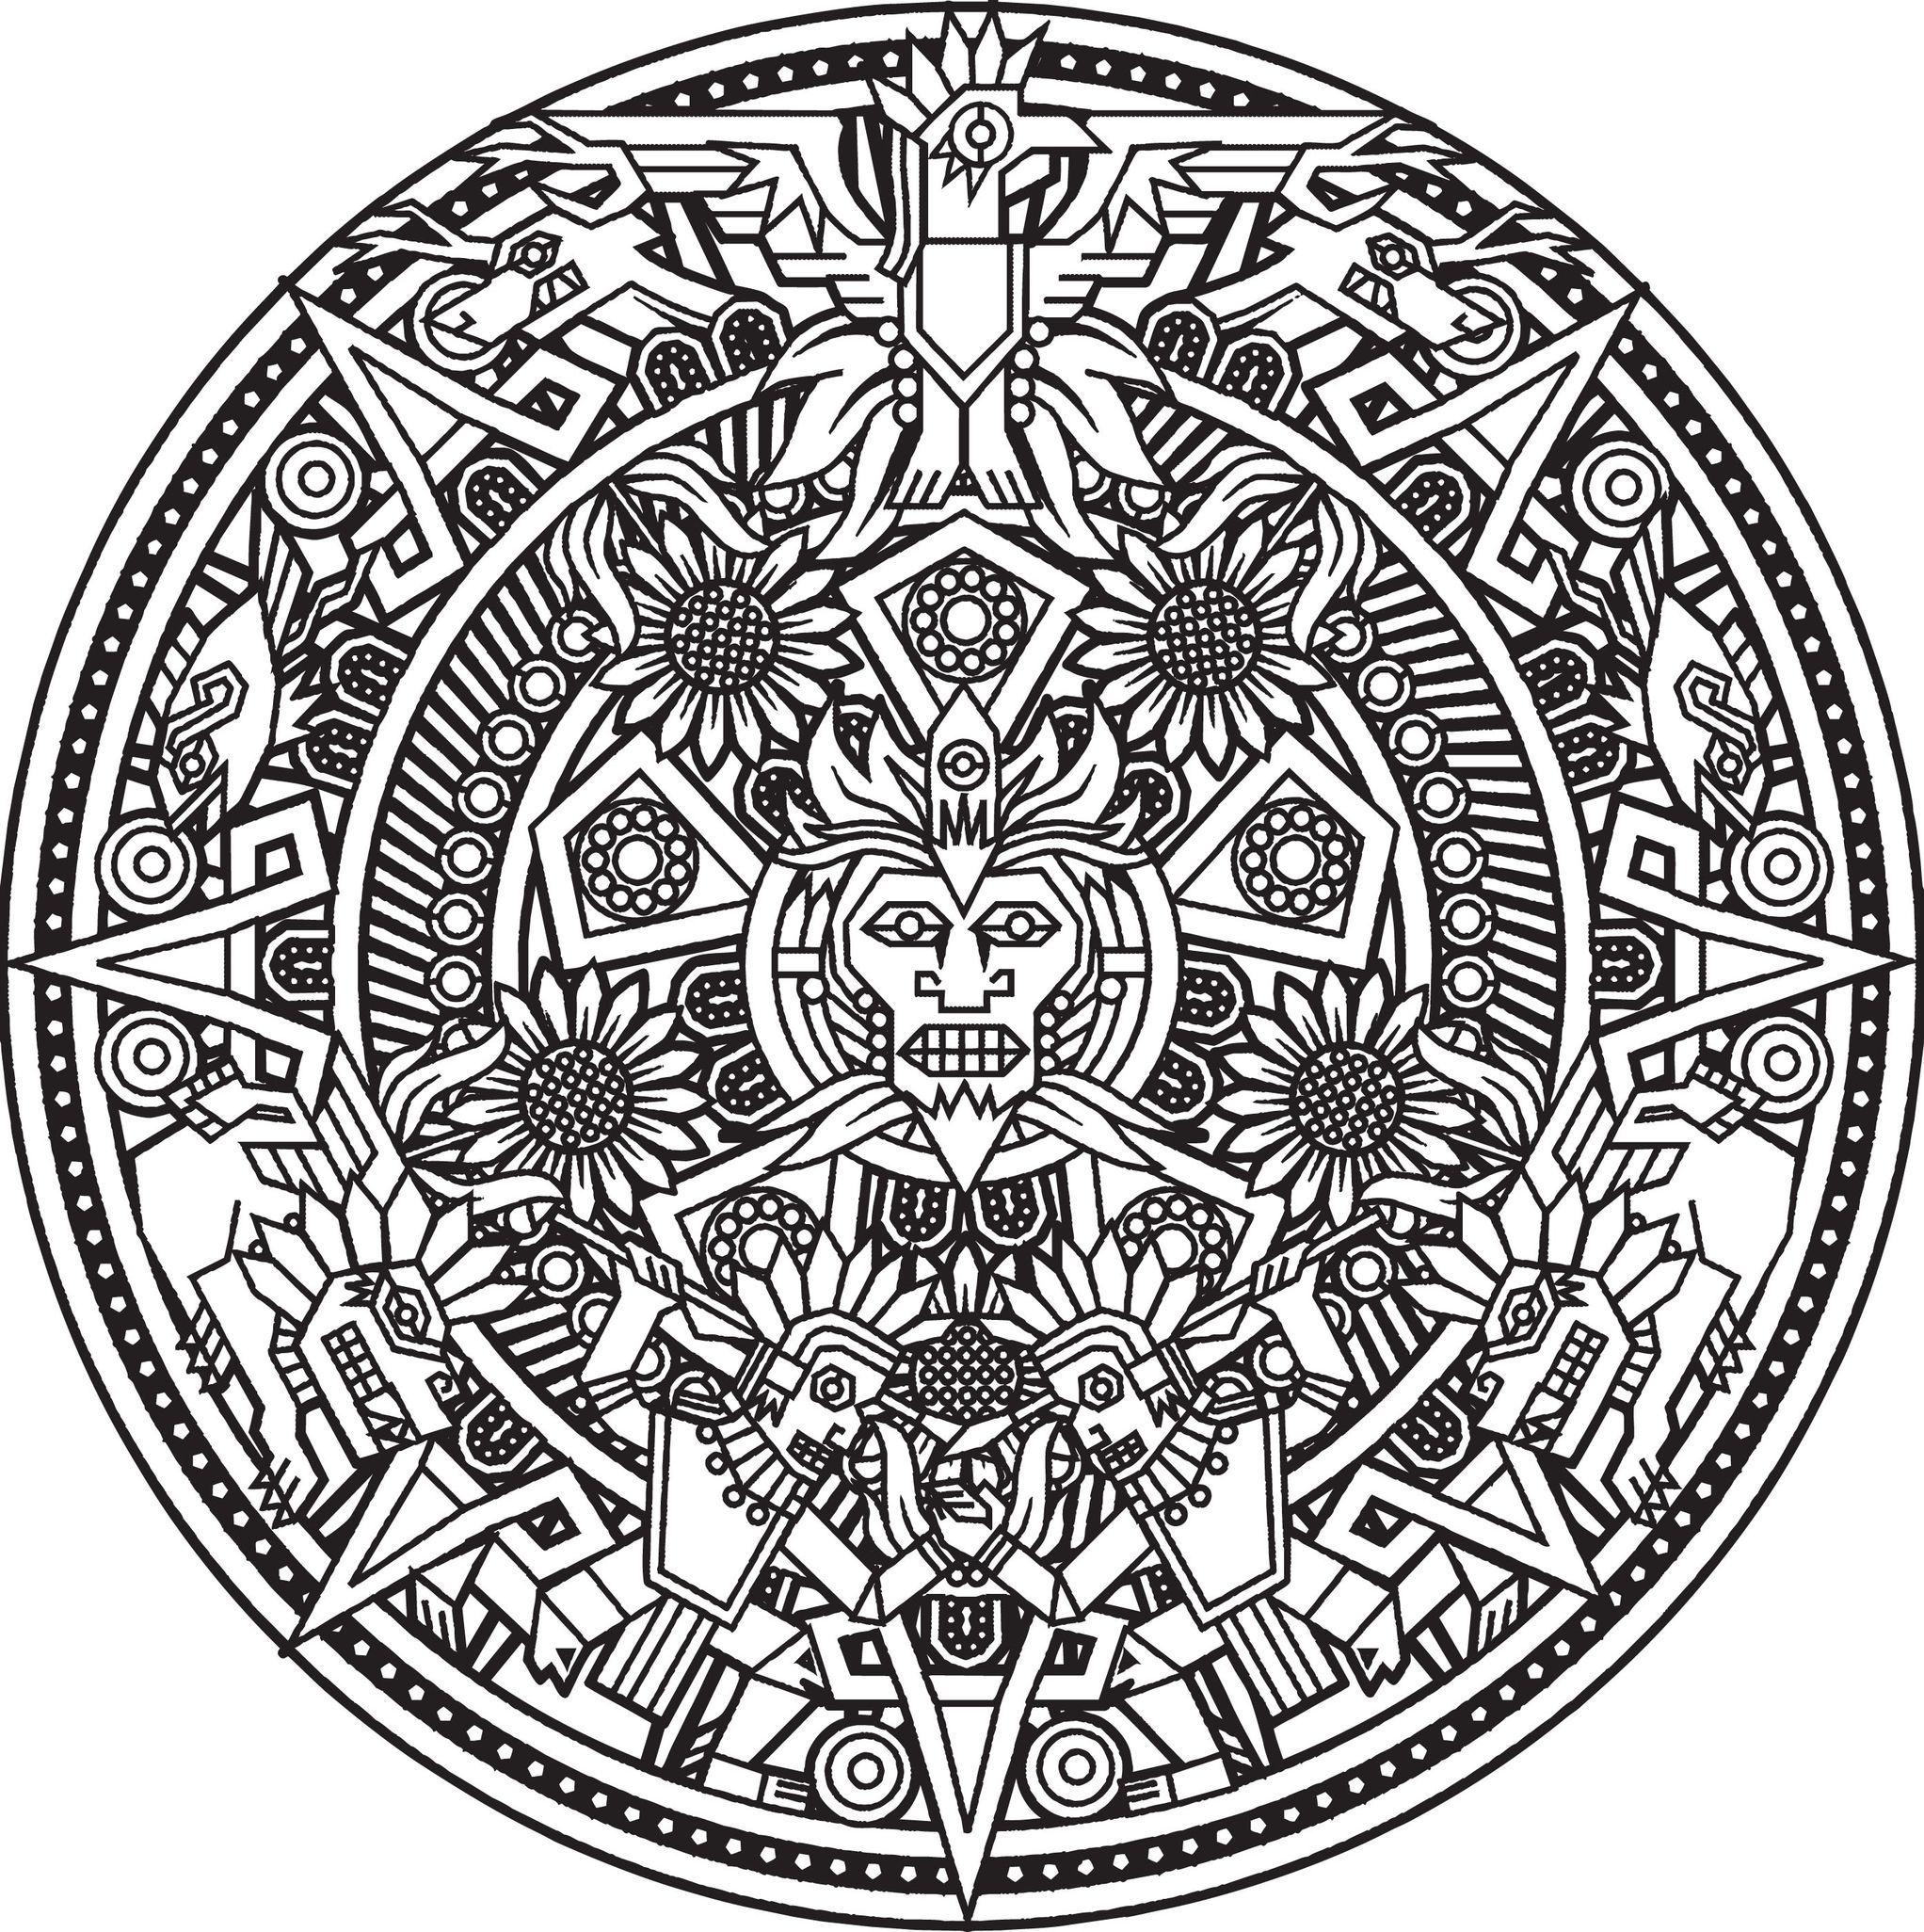 Calendario solar azteca que se convierte en un lindo mandala para ...